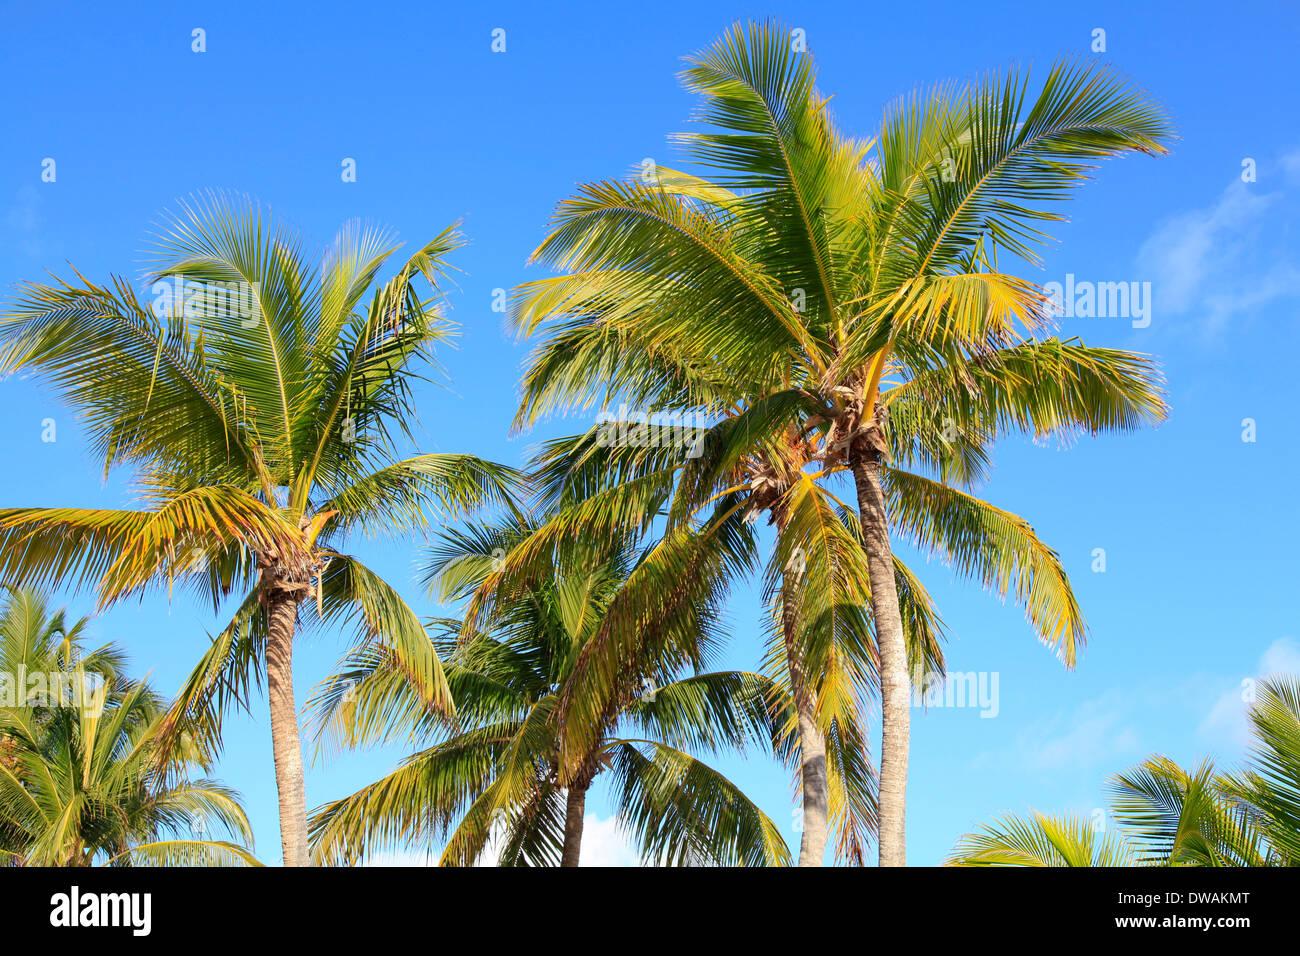 Palmen in Mami Beach, Florida, USA Stockbild